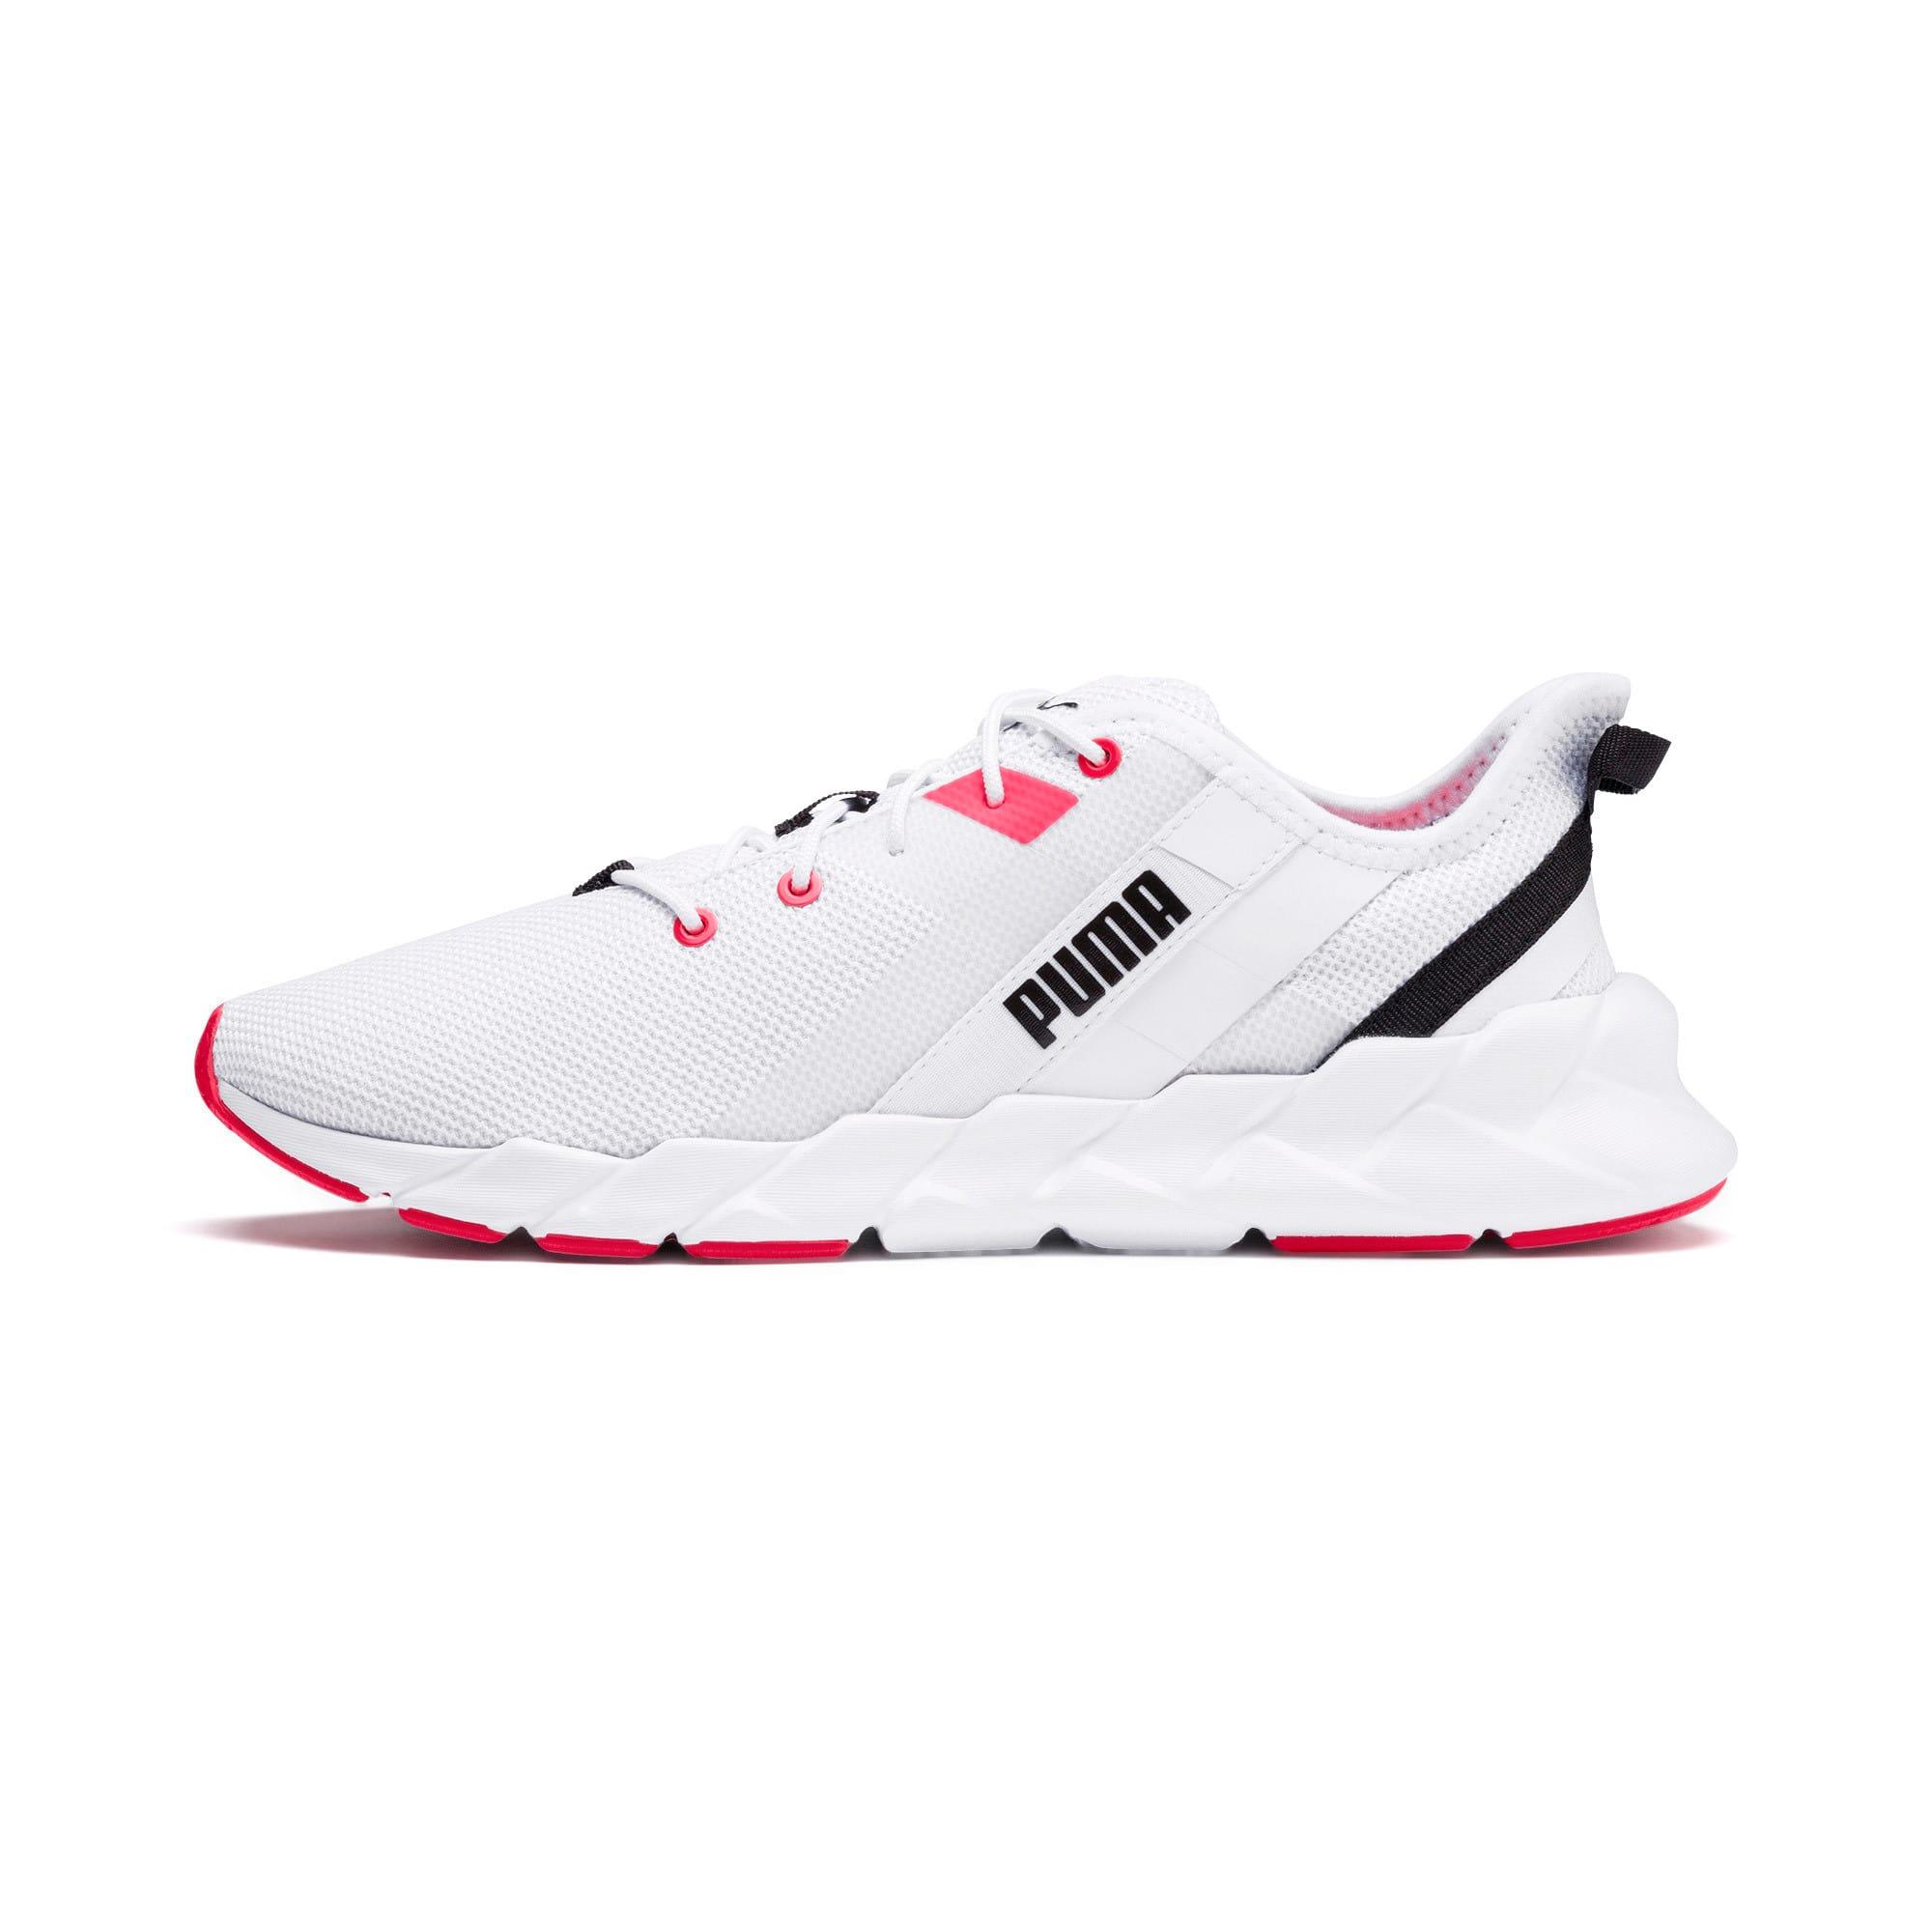 Thumbnail 1 of Weave XT Women's Training Shoes, Puma White-Pink Alert, medium